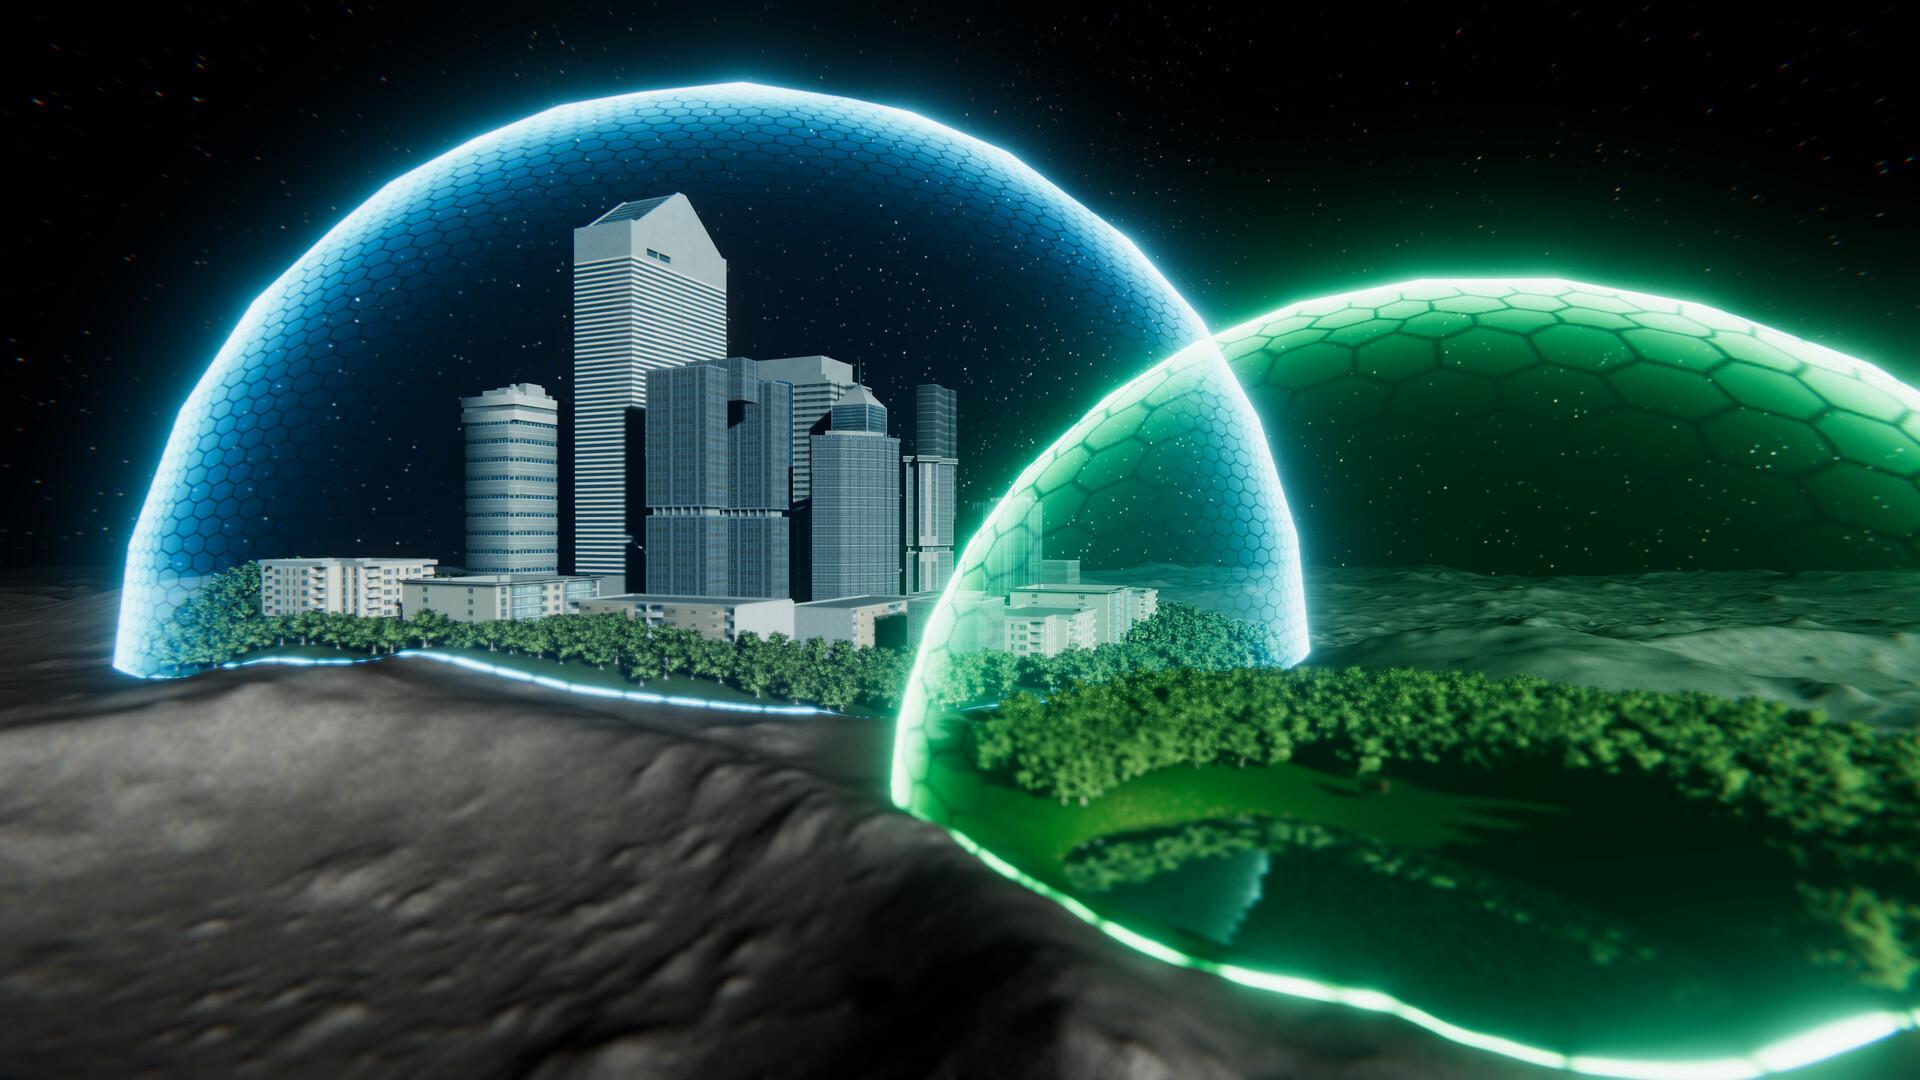 ArtStation - City on the Moon, Malik Ouda